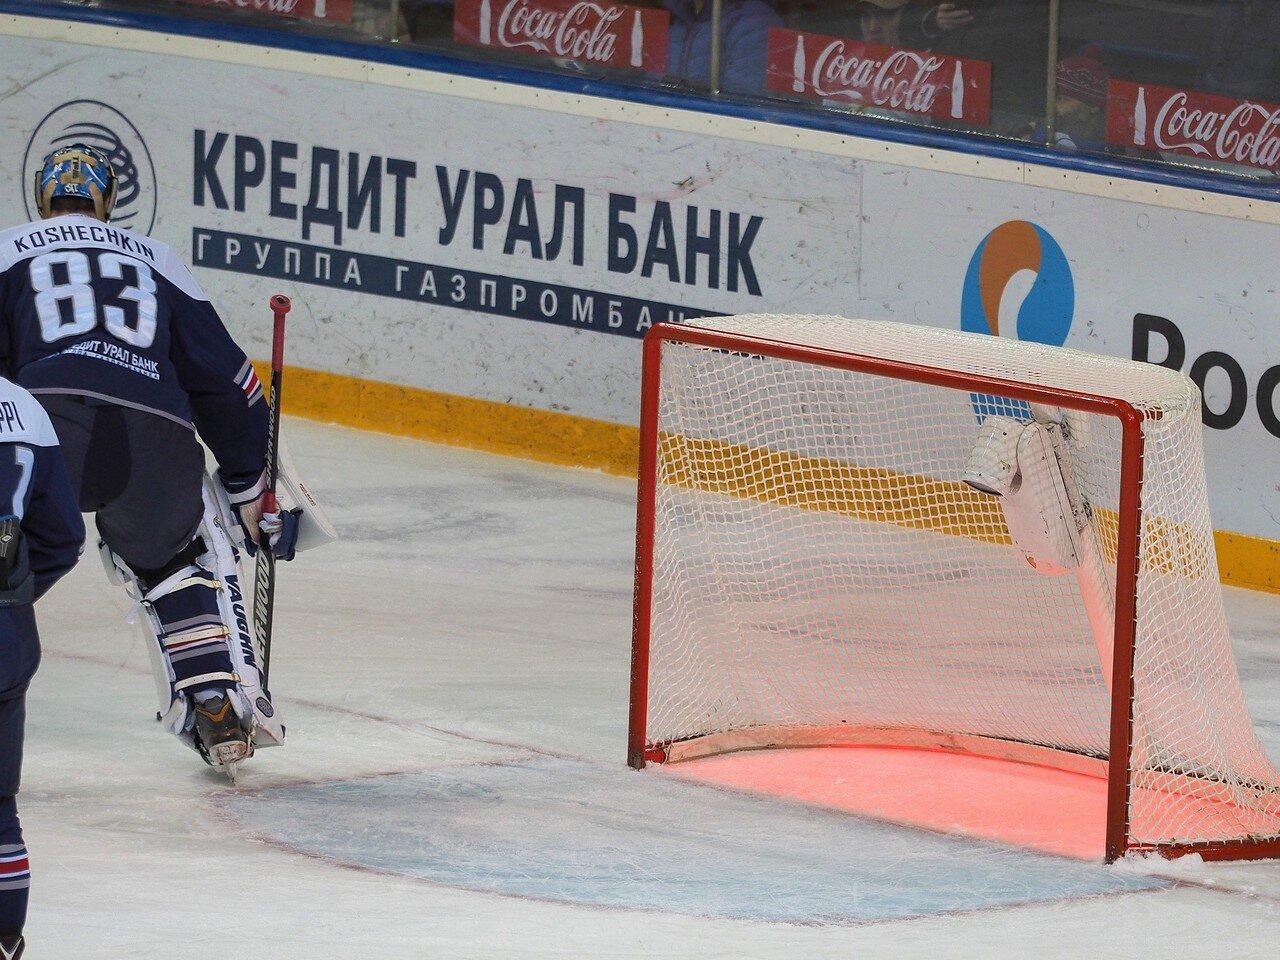 76Плей-офф 2016 Восток 1/2 Металлург - Сибирь 10.03.2016